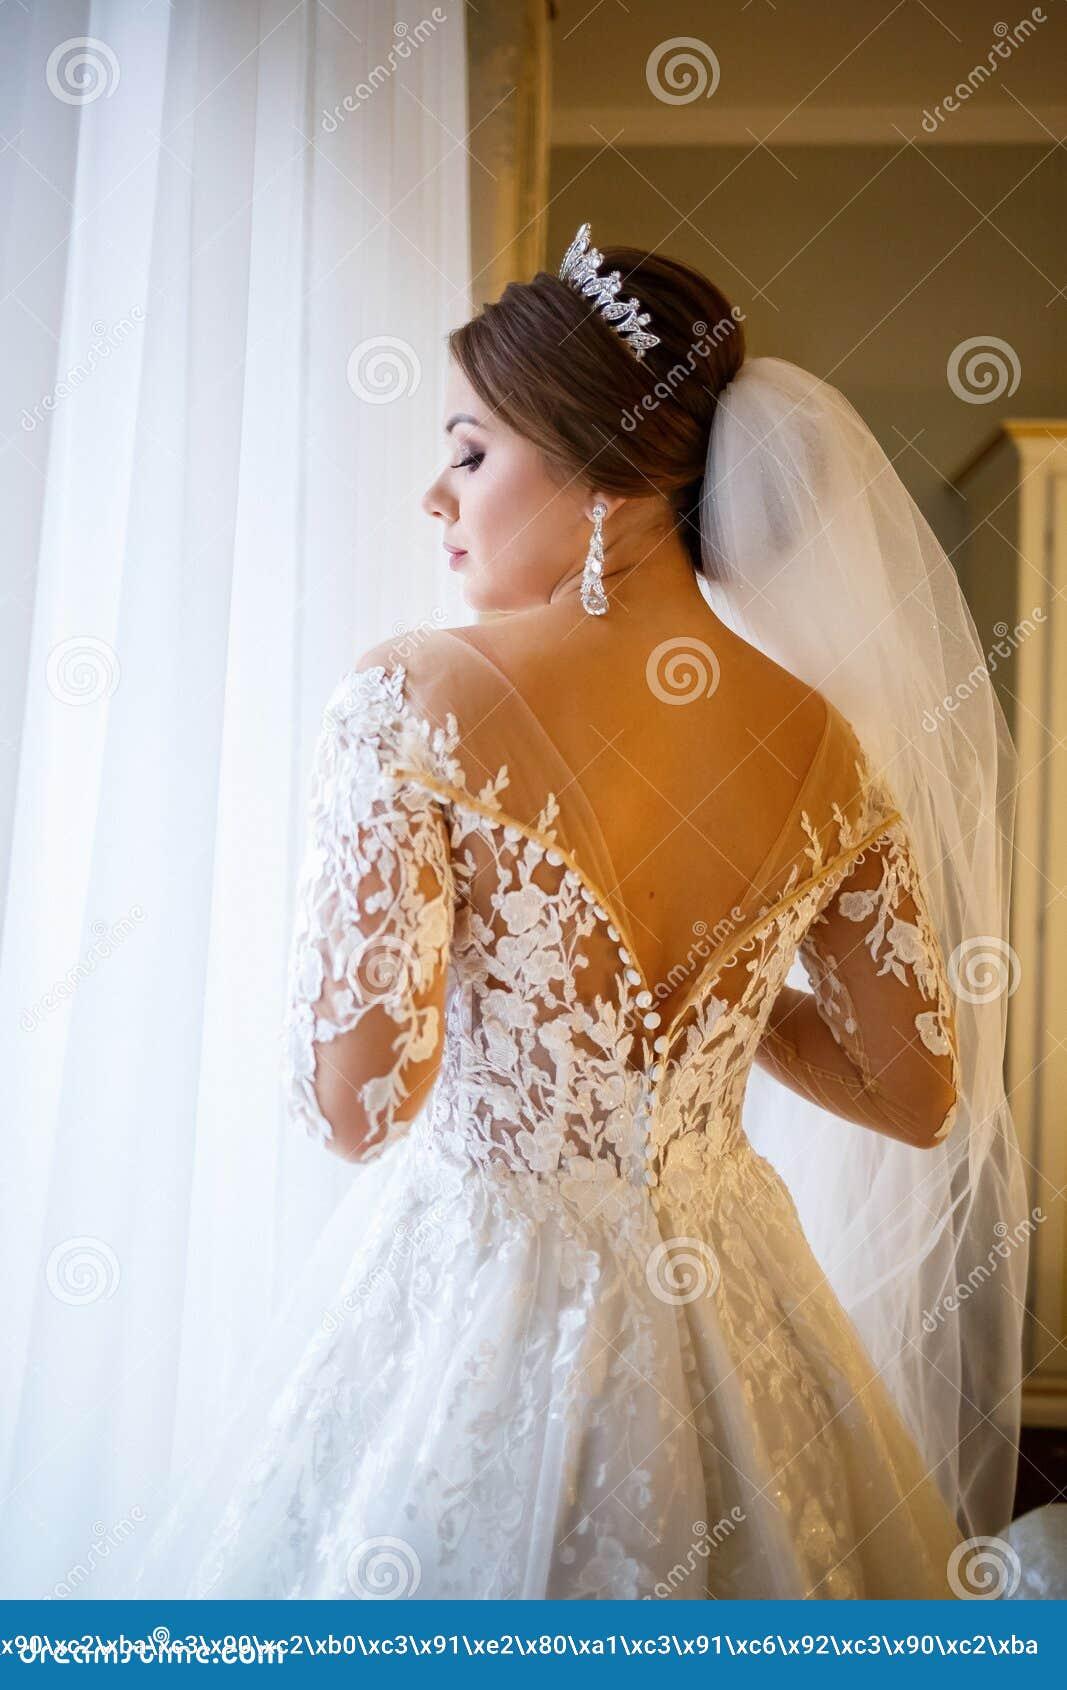 Beautiful Bride Dresses Her White Wedding Dress Stock Photo Image Of Elegant Gown 169630436,Fashionable Maria B Fashionable Wedding Dresses For Girls 2020